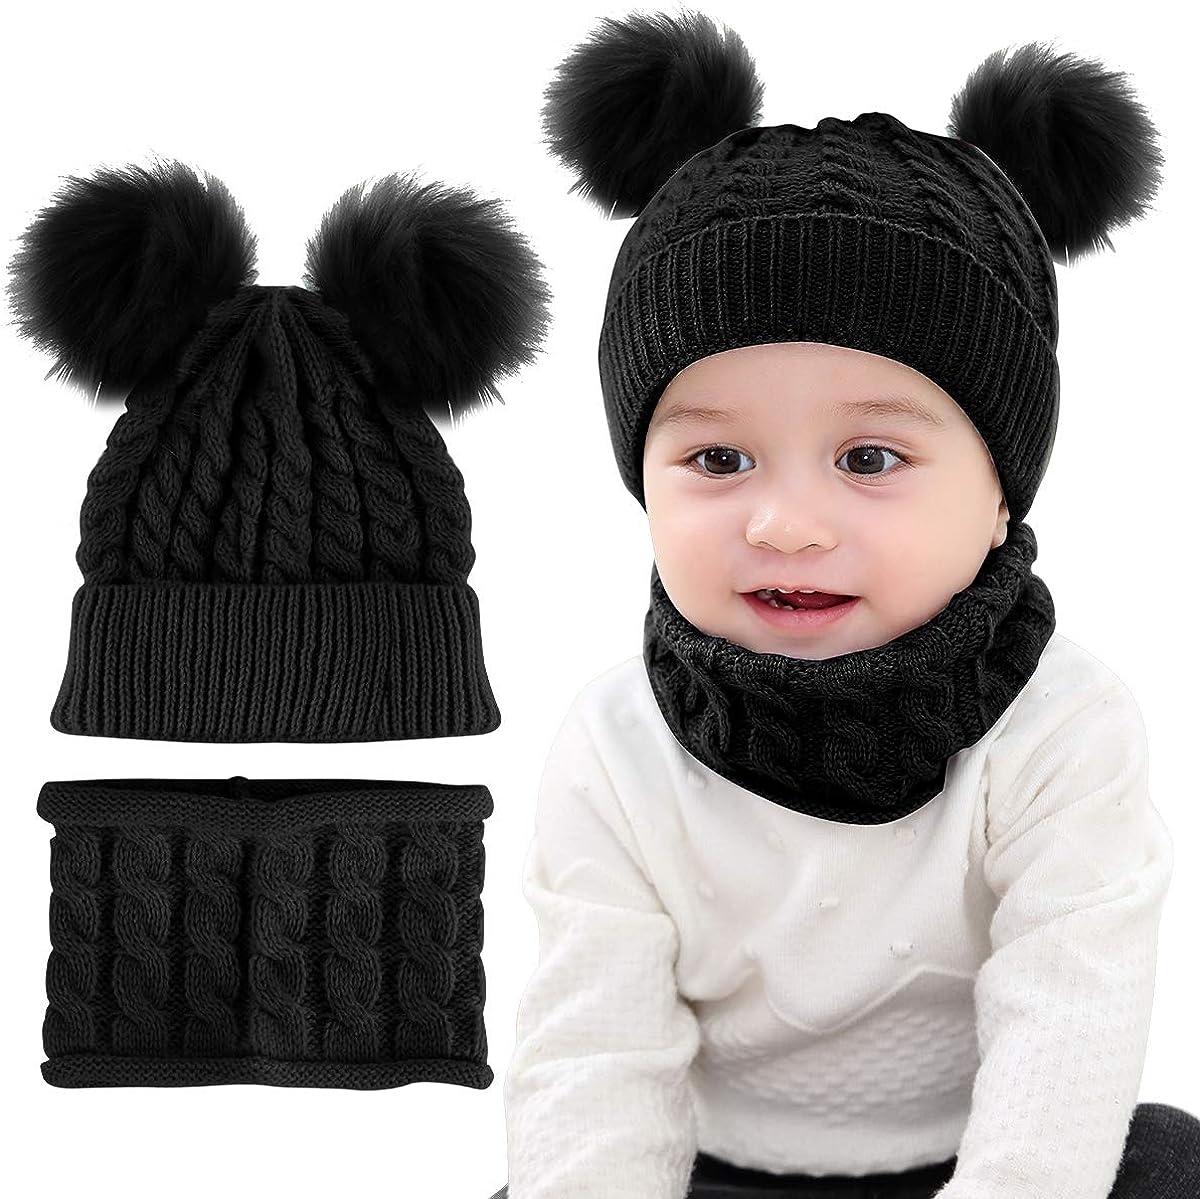 Baby Pom Pom Hat Scarf Set Winter Toddler Beanie Cap Circle Loop Scarf Neckwarmer Set